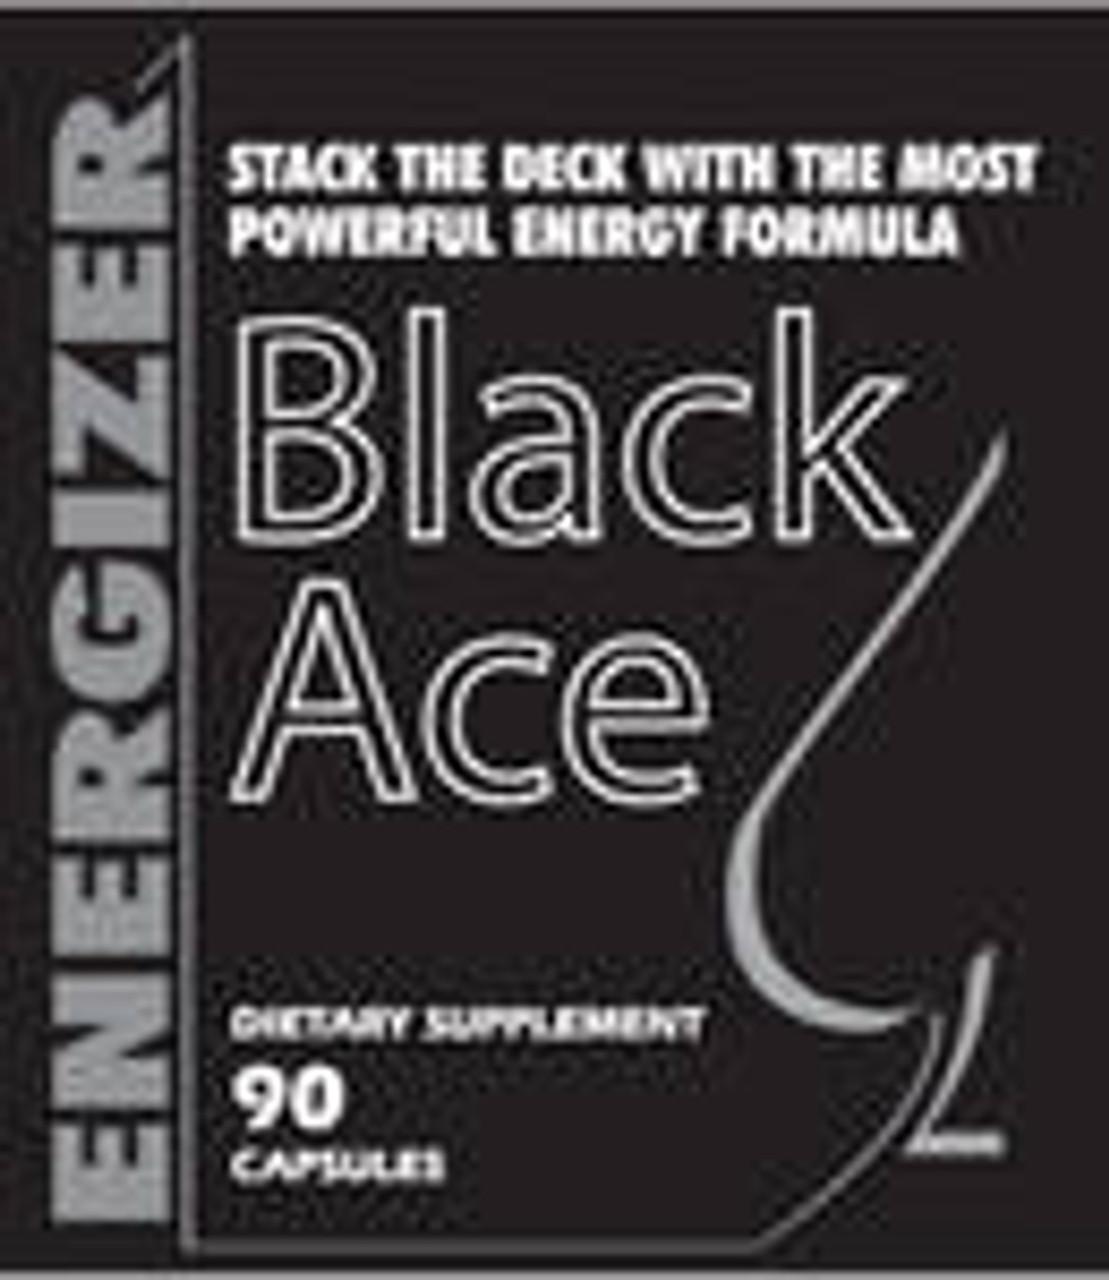 Black Ace Ephedra 90ct